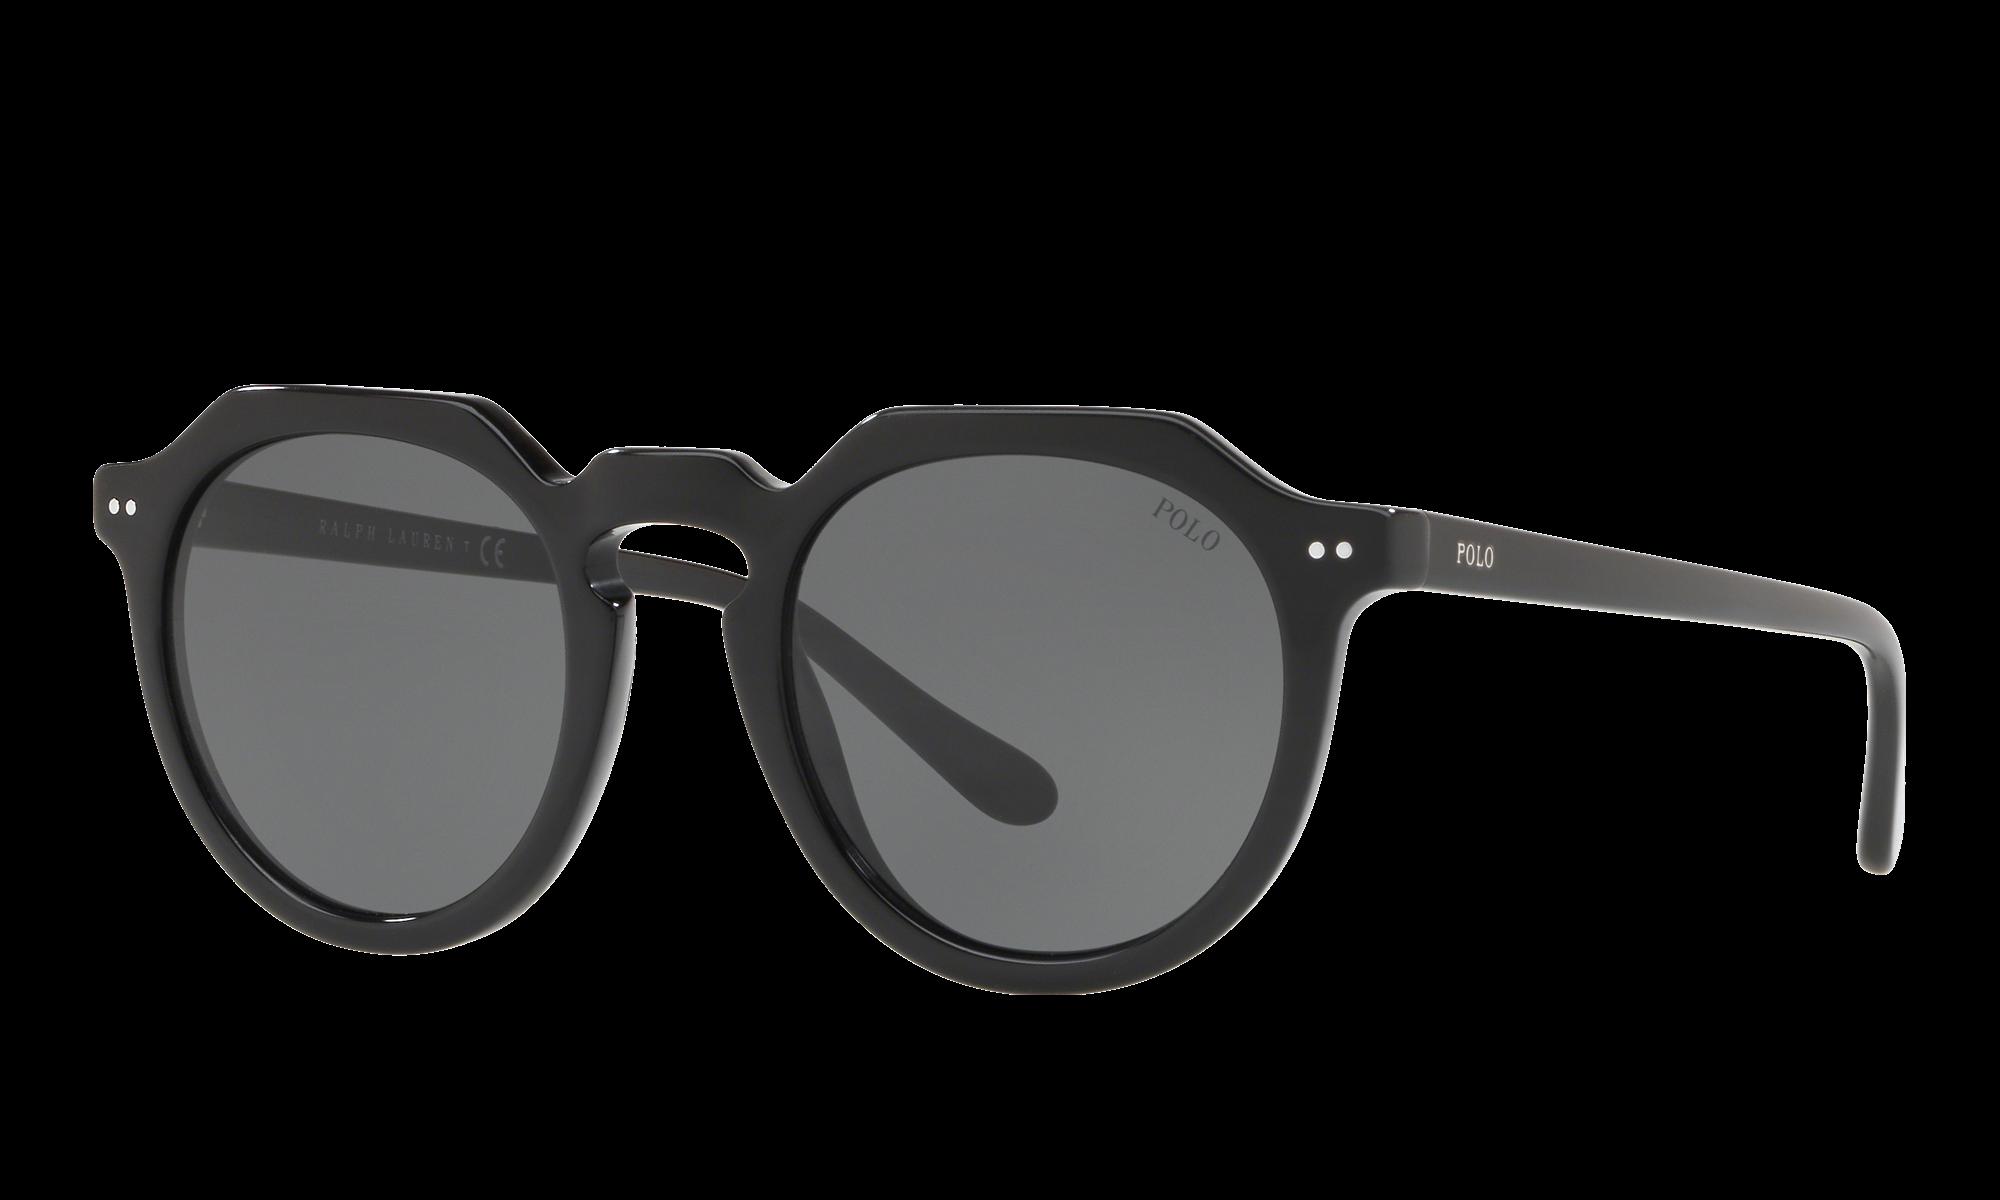 1930s Glasses and Sunglasses History Polo Ralph Lauren Unisex Ph4138 Black Size Standard $79.00 AT vintagedancer.com